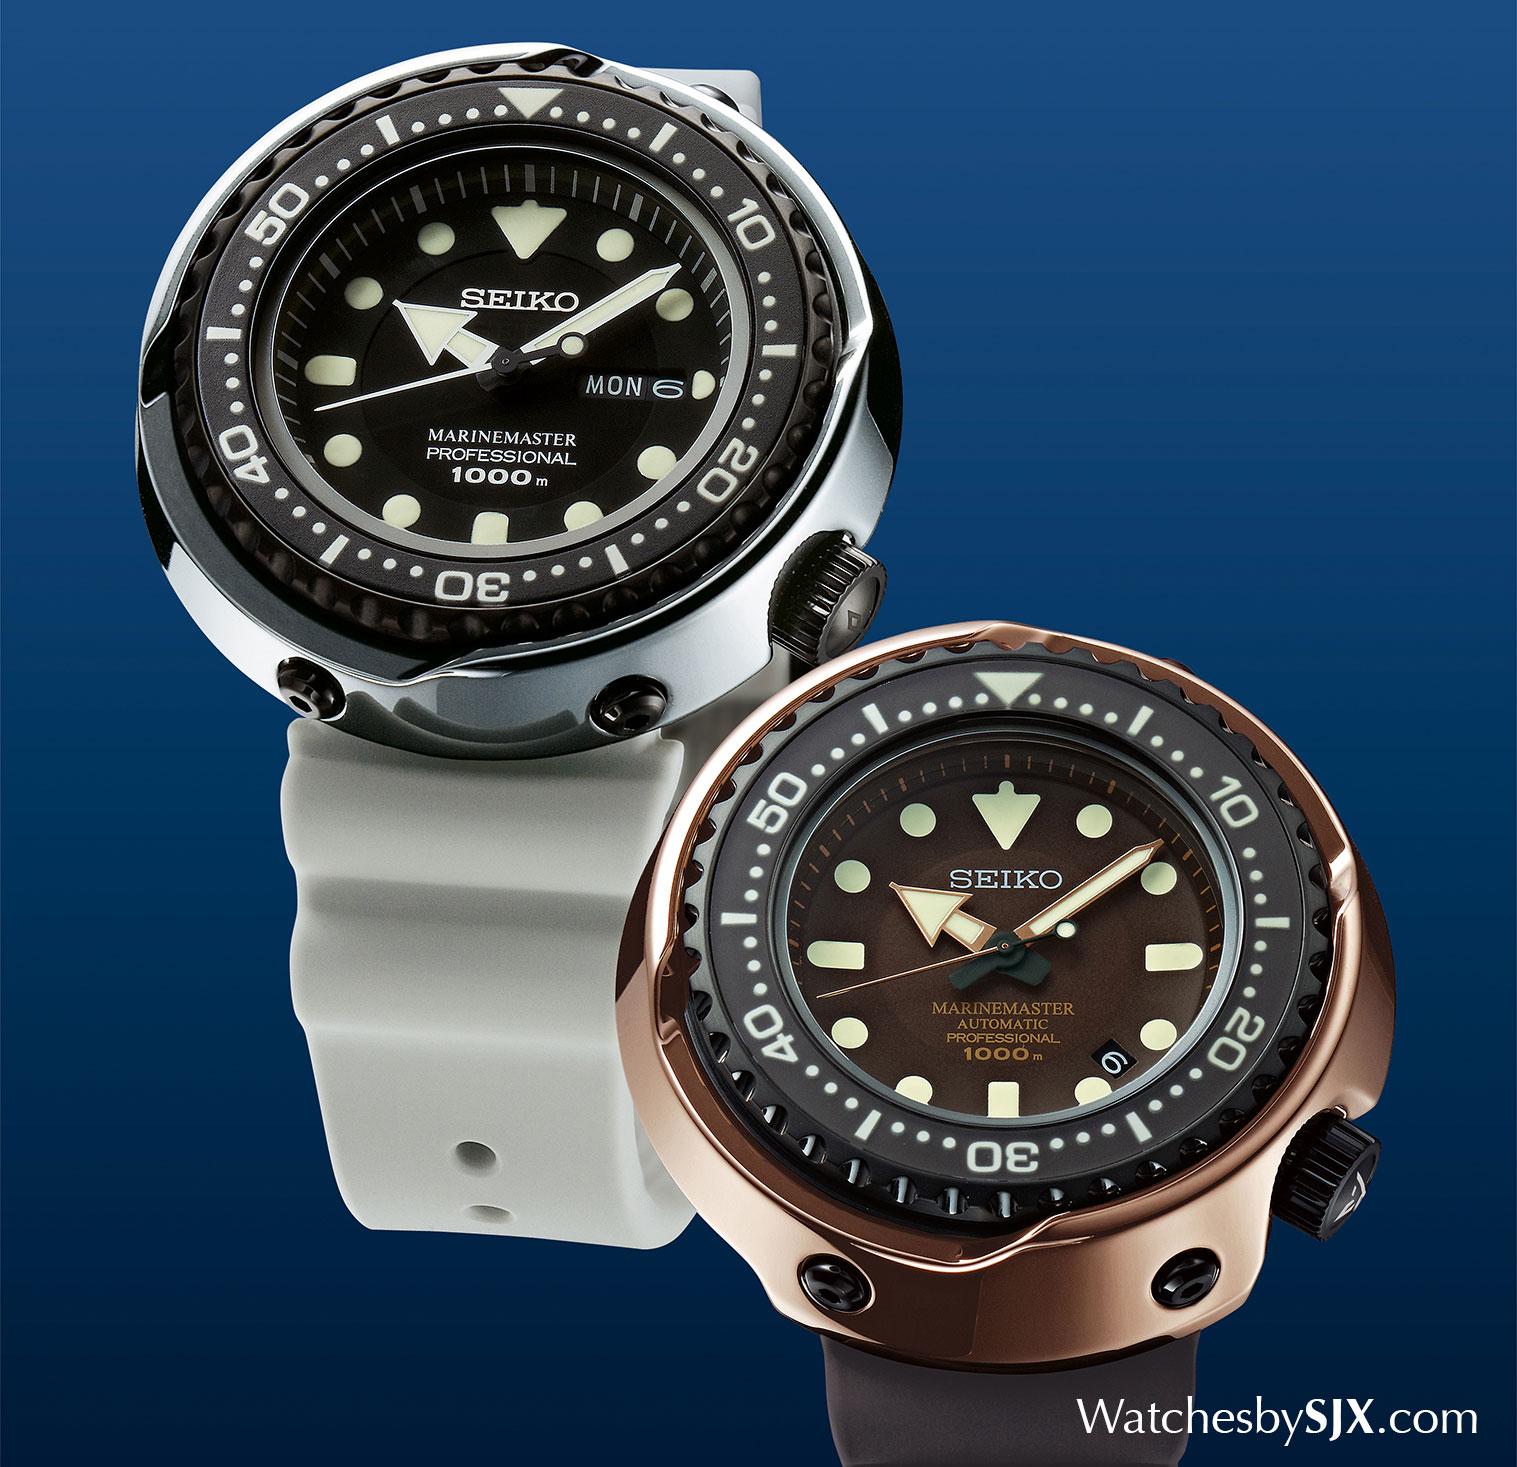 Seiko-Marinemaster-Tuna-Cermet